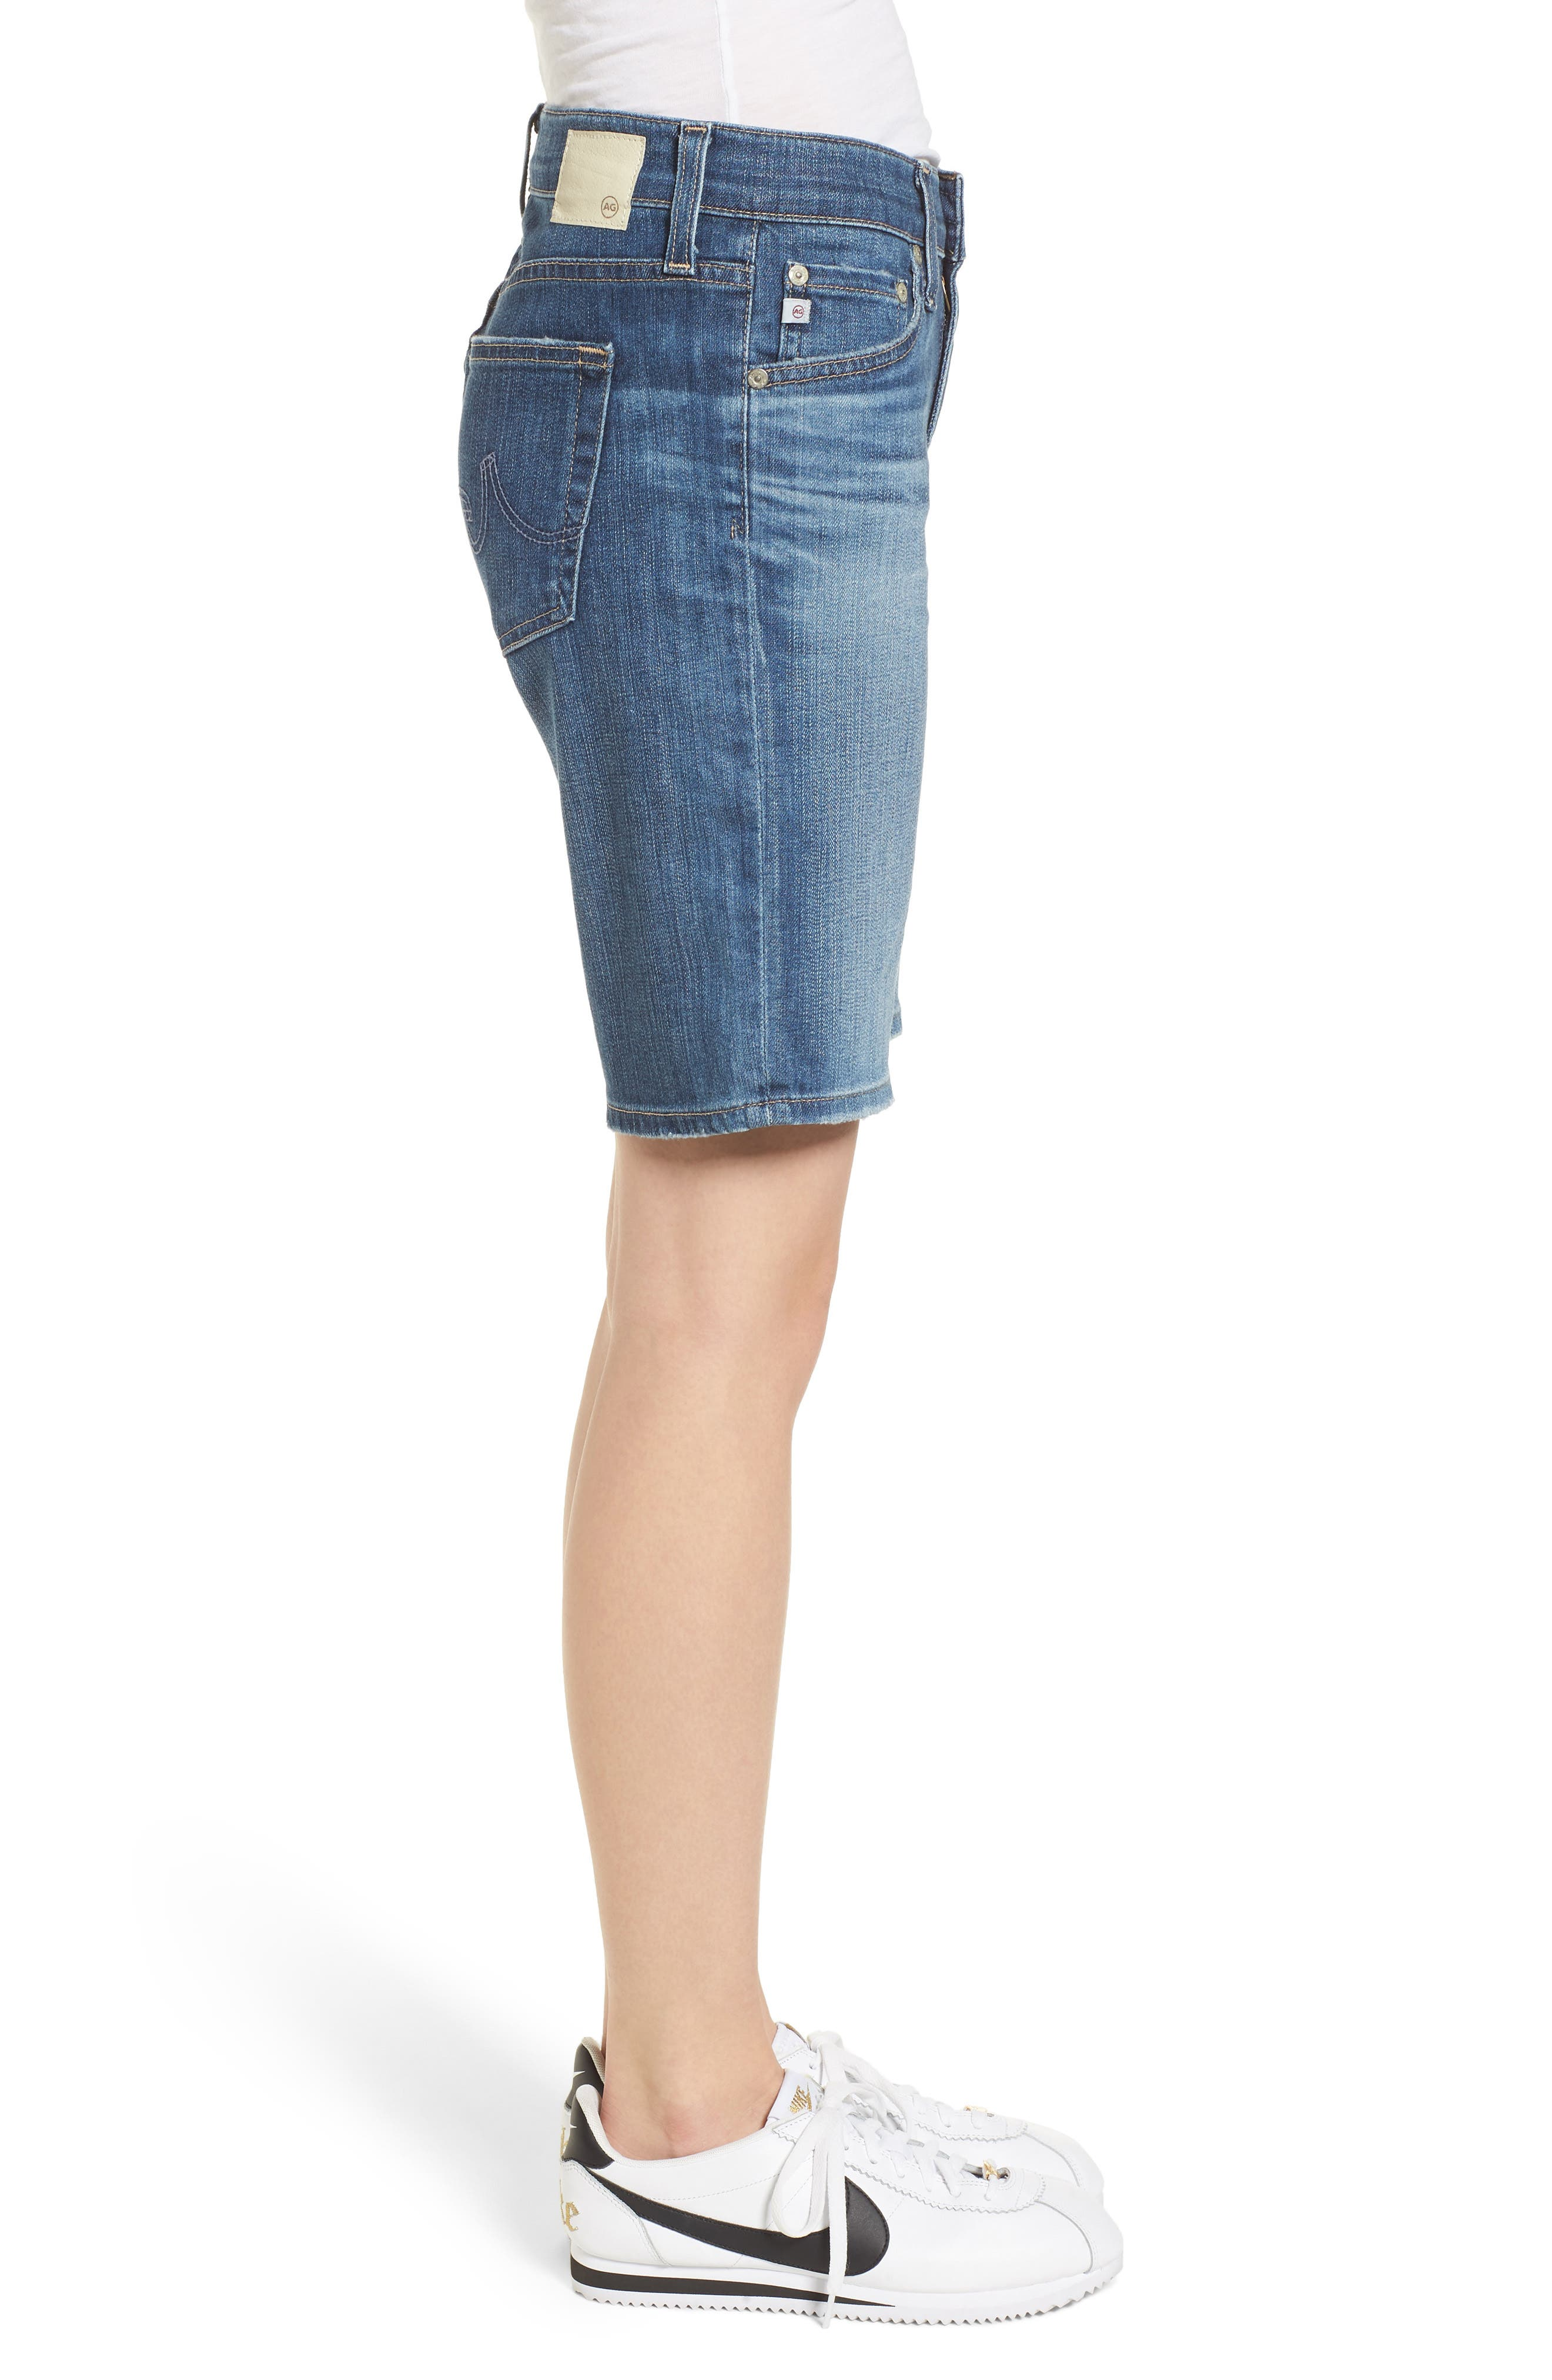 'Nikki' Distressed Denim Bermuda Shorts,                             Alternate thumbnail 3, color,                             11 Years Sapphire Sky